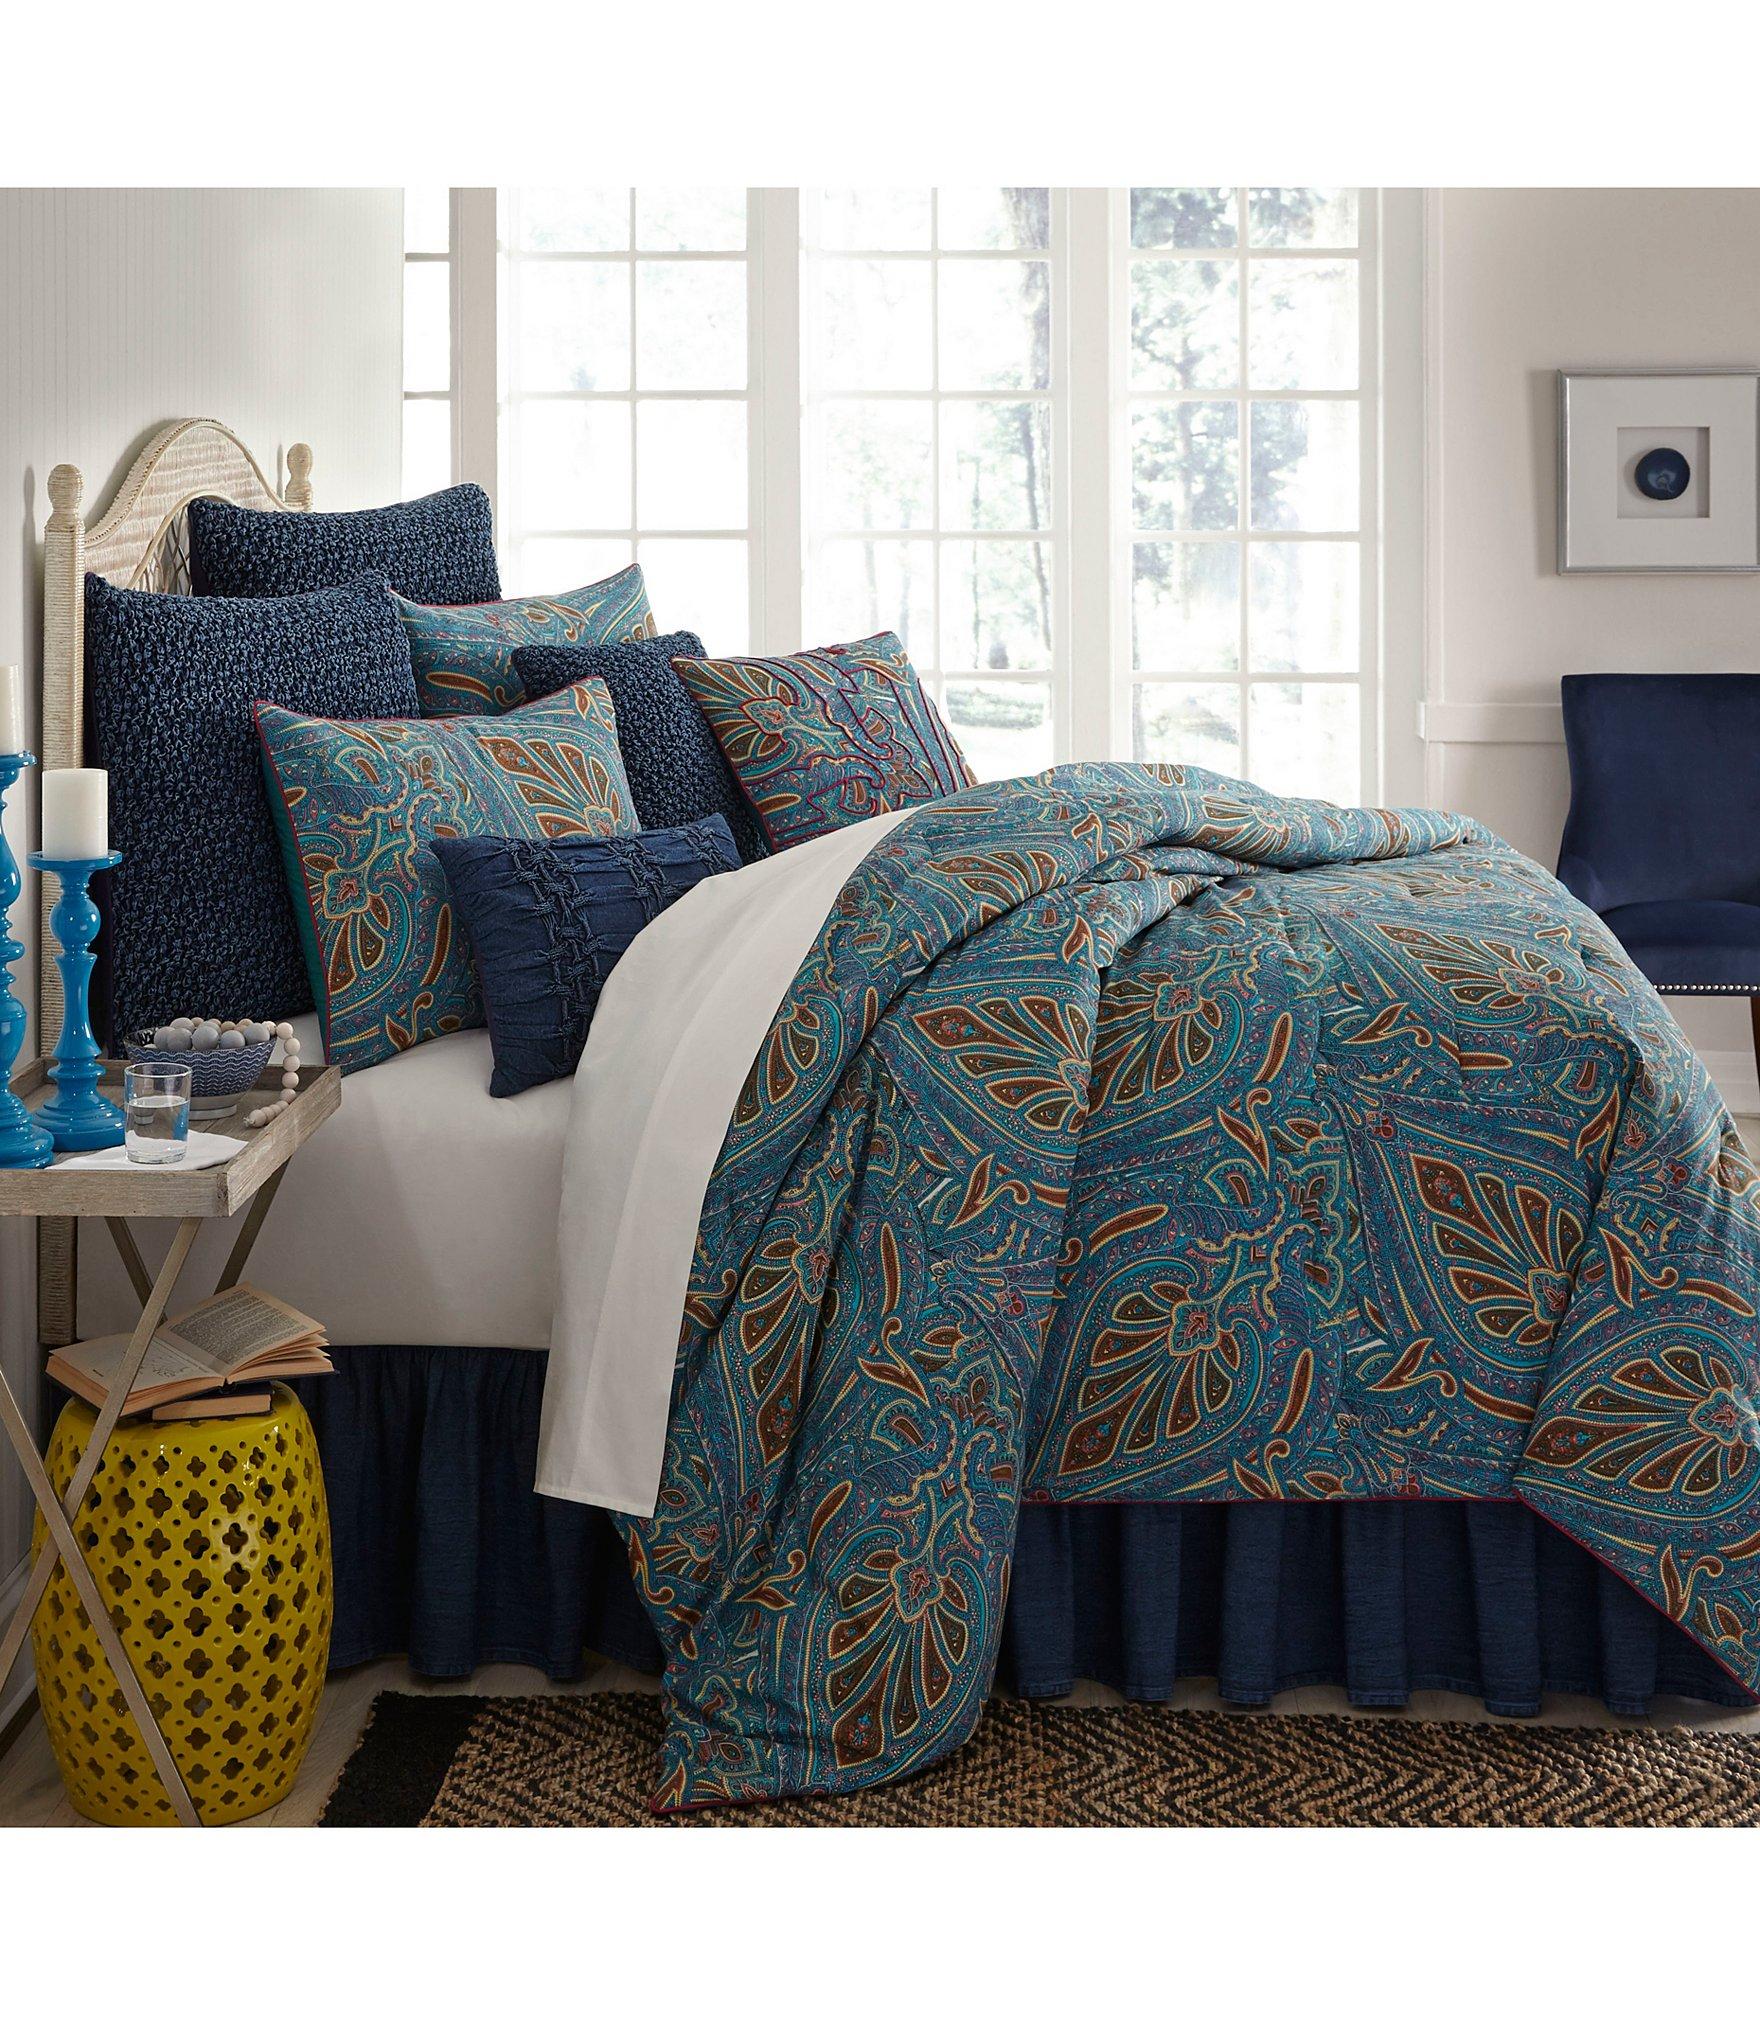 Michael Kors Crossbody Dillards Quilts Mksale